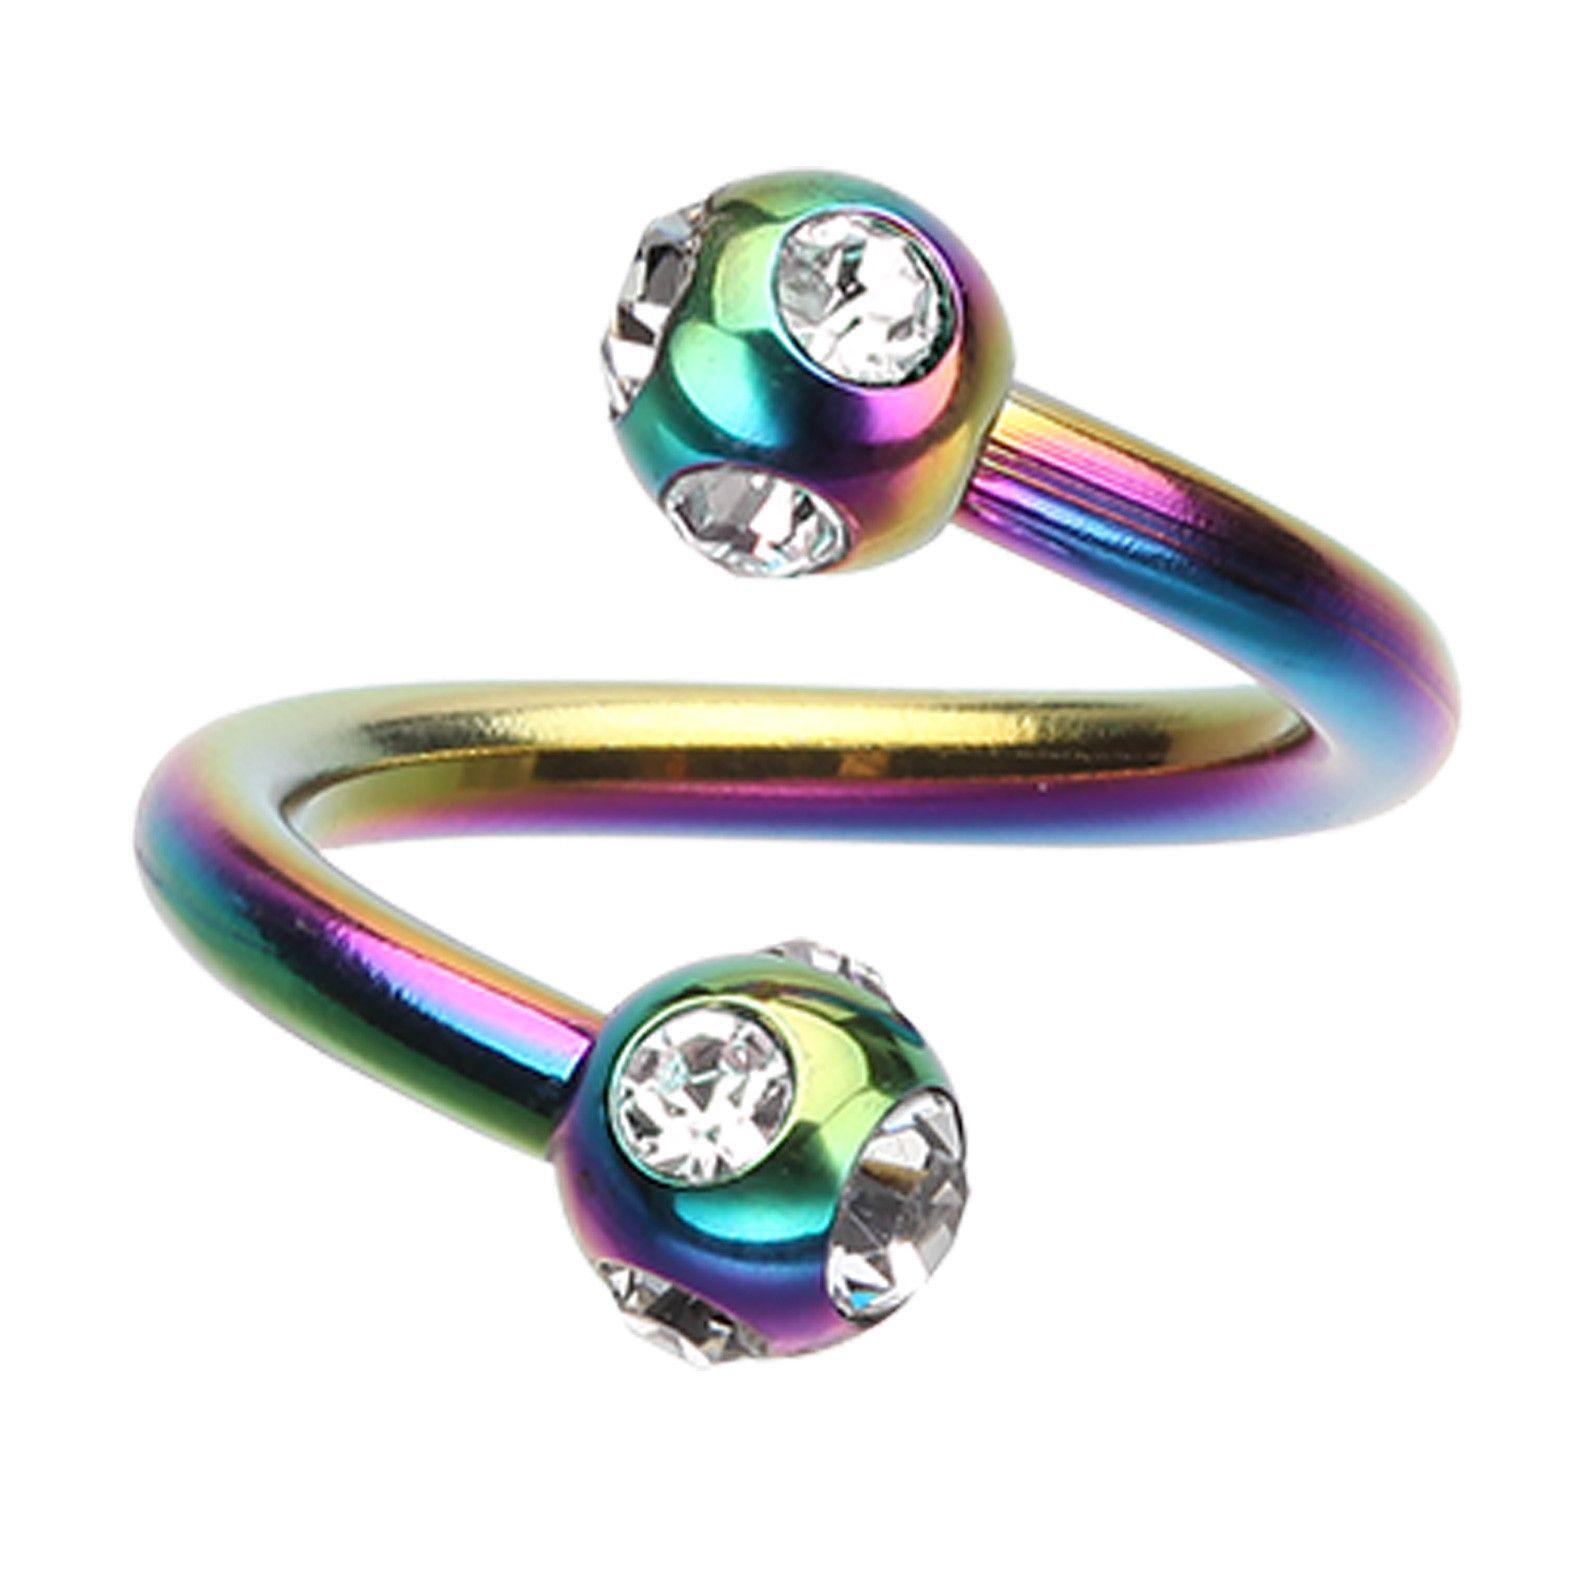 Multi Glass-Gem Horseshoe Circular Barbell 1.2mm - Sold as a Pair 4mm - Ball Size: 5//32 16 GA